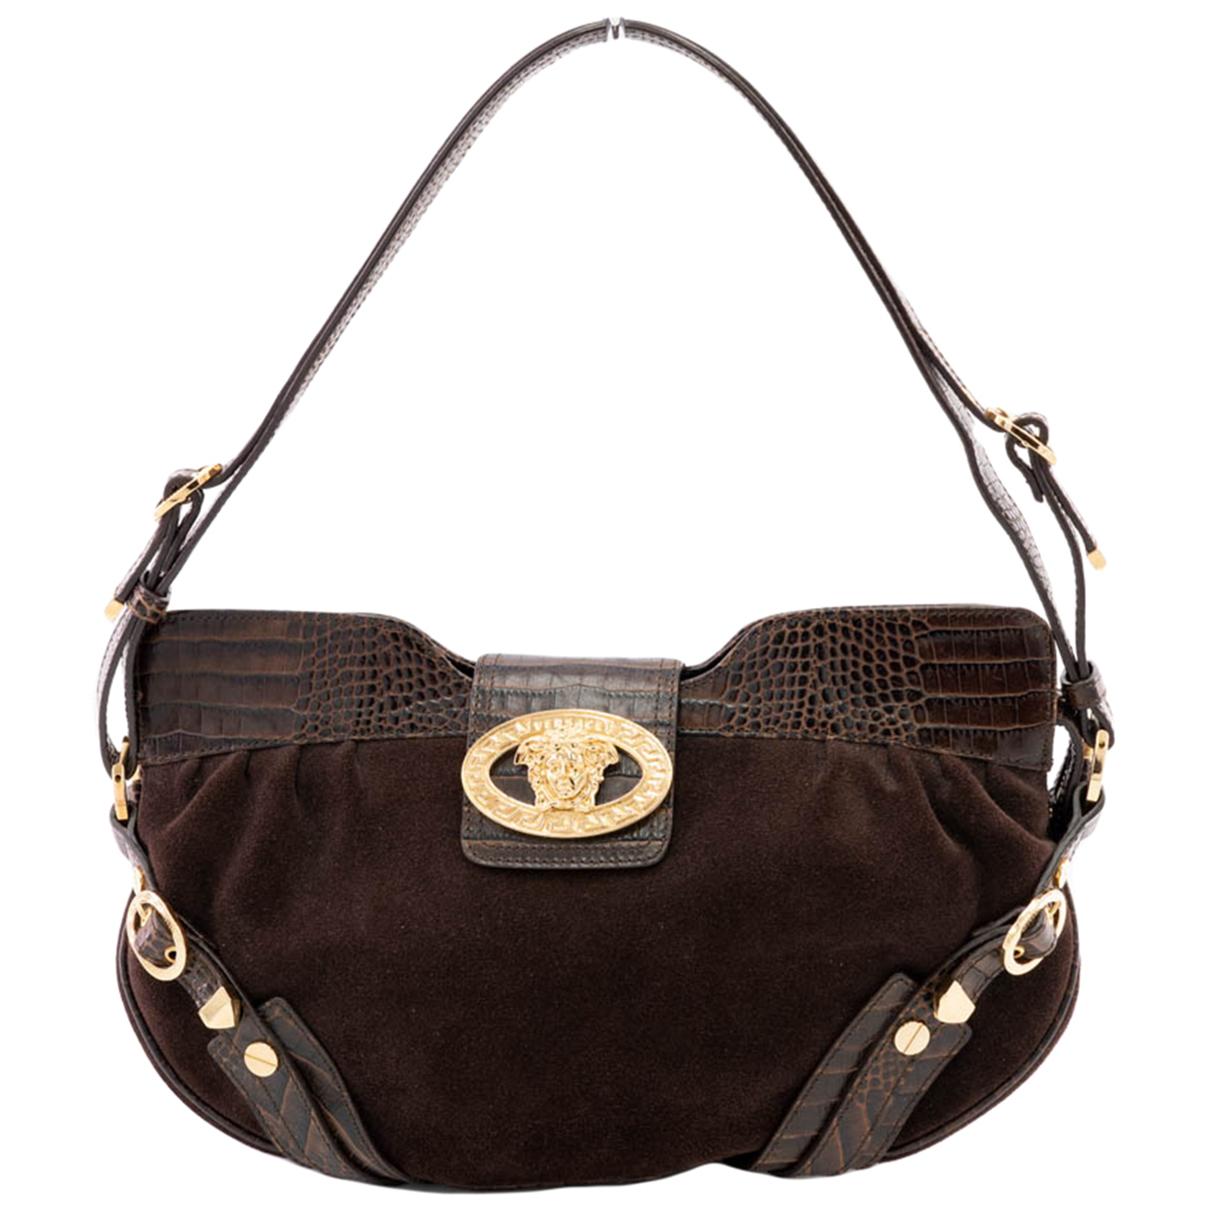 Versace \N Handtasche in  Braun Krokodil